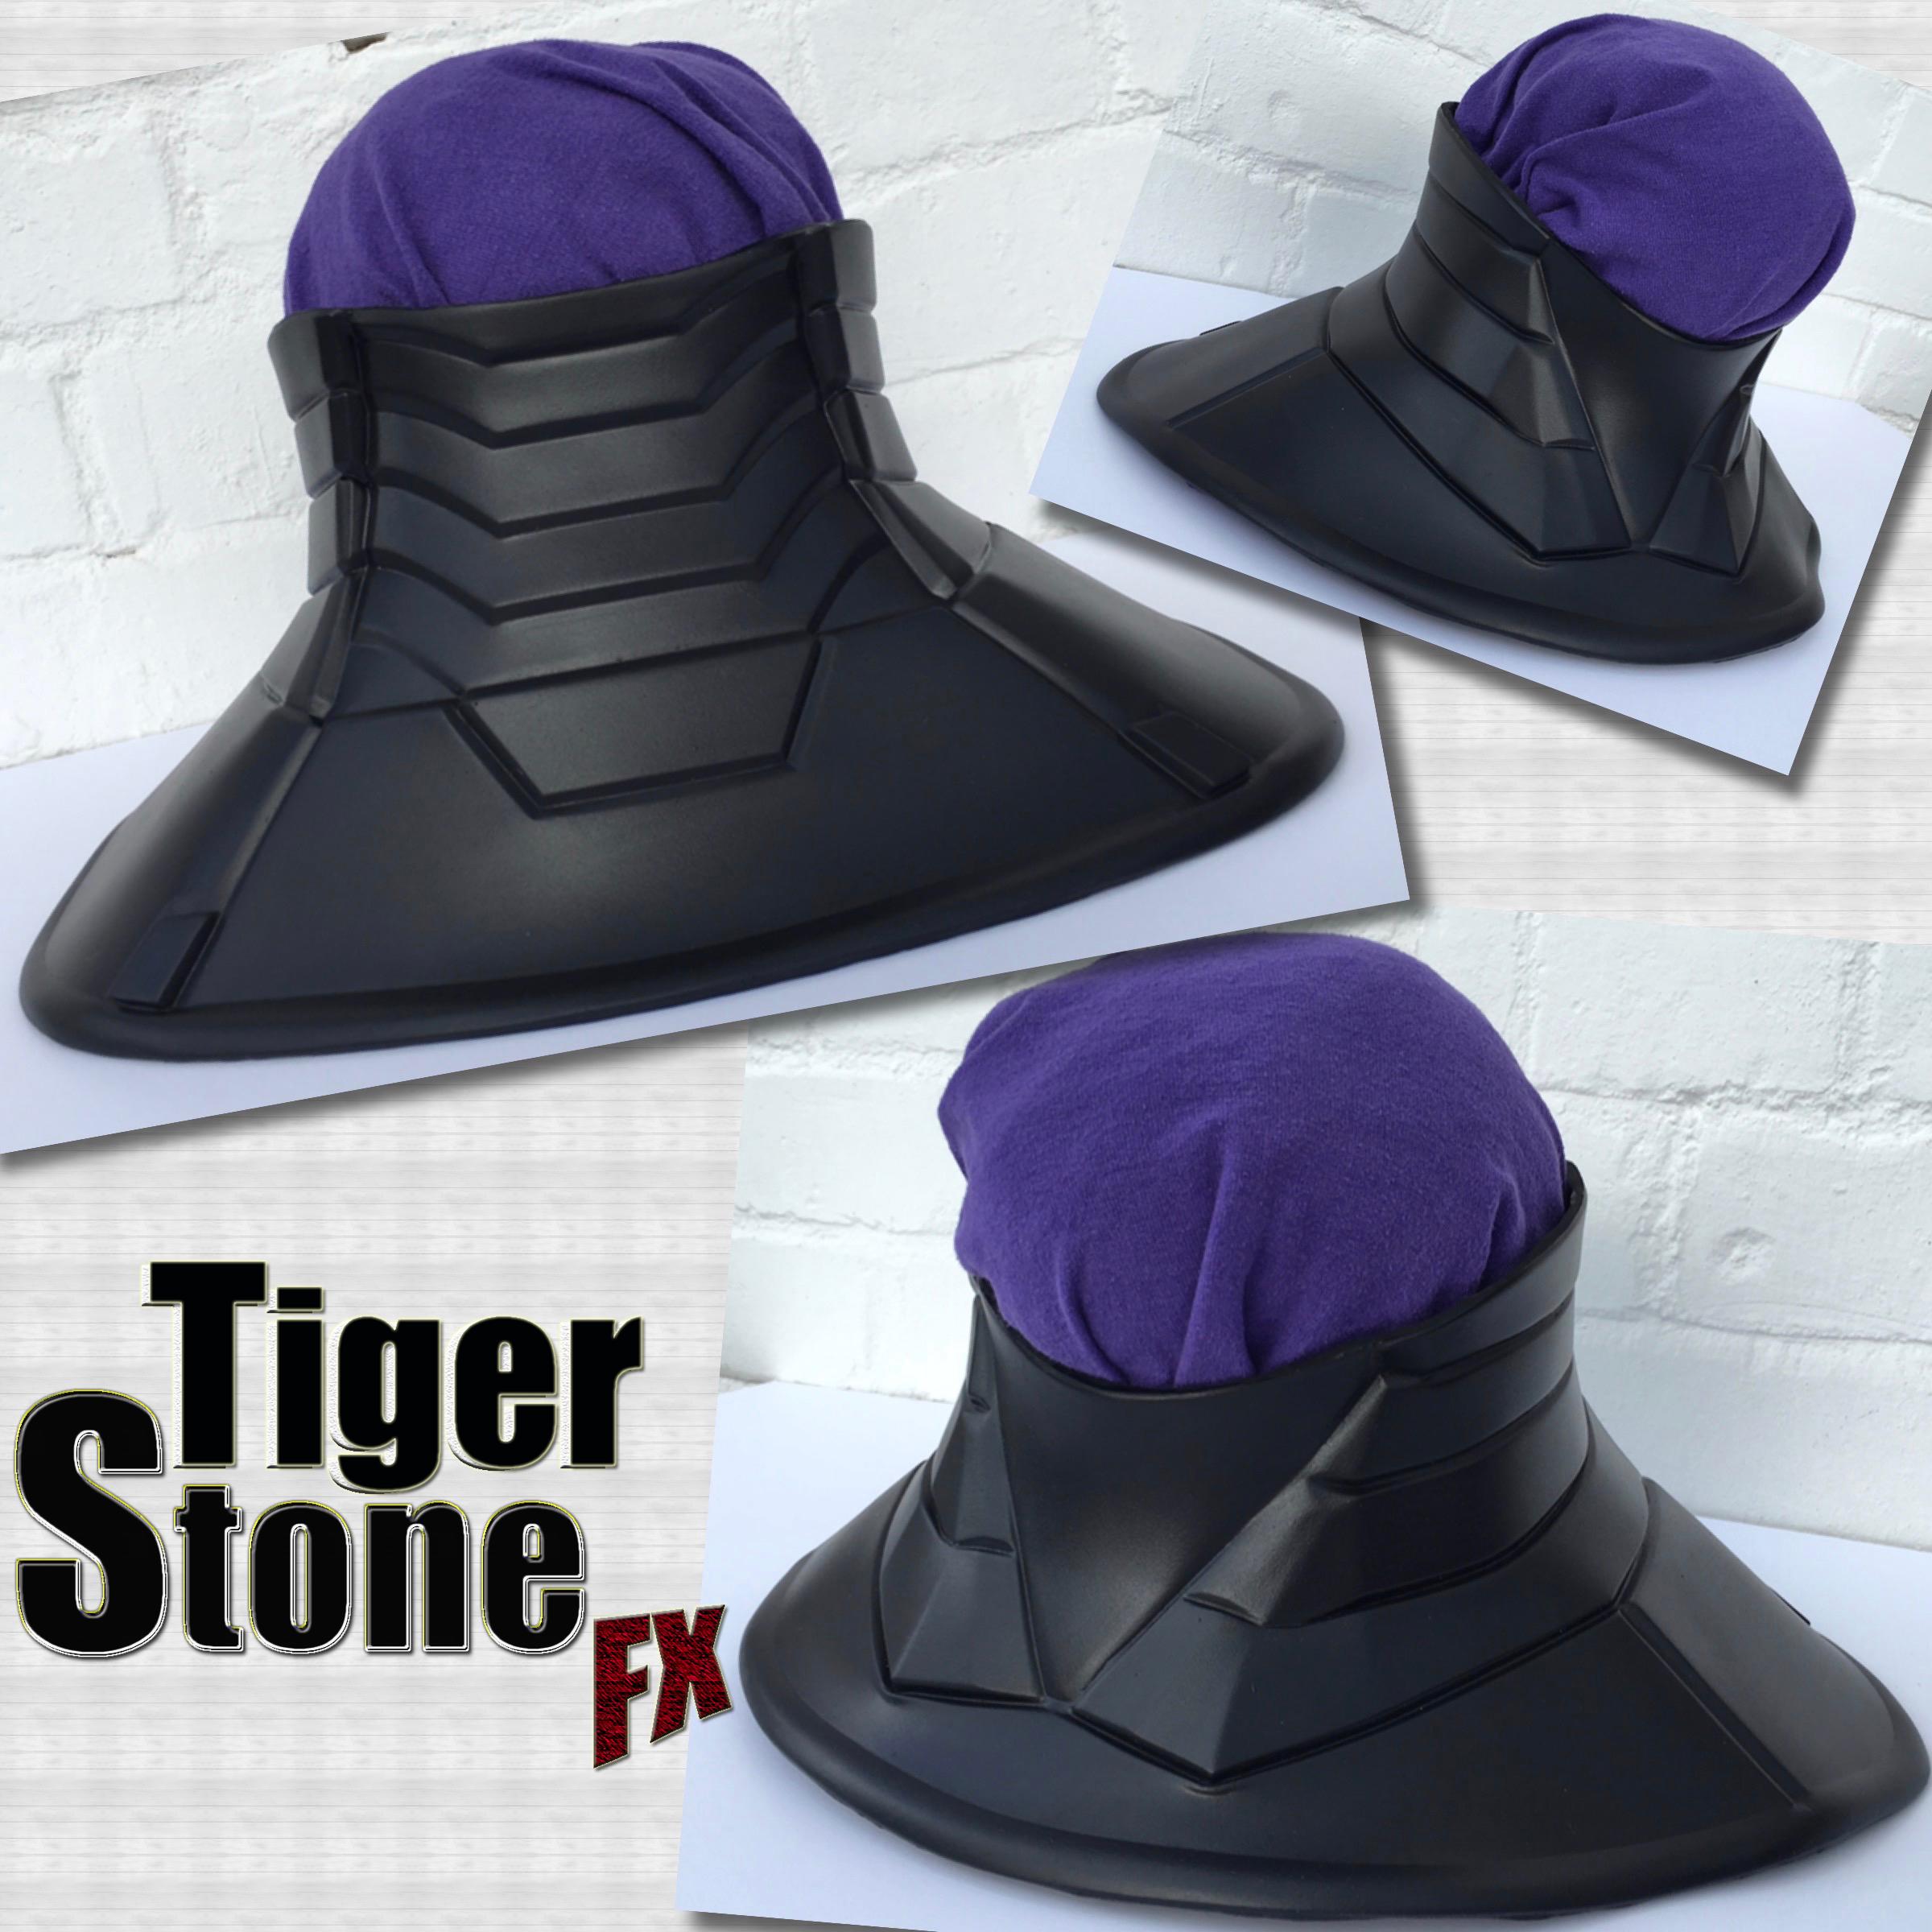 batman new 52 cowl neck armor by tiger stone fx tiger